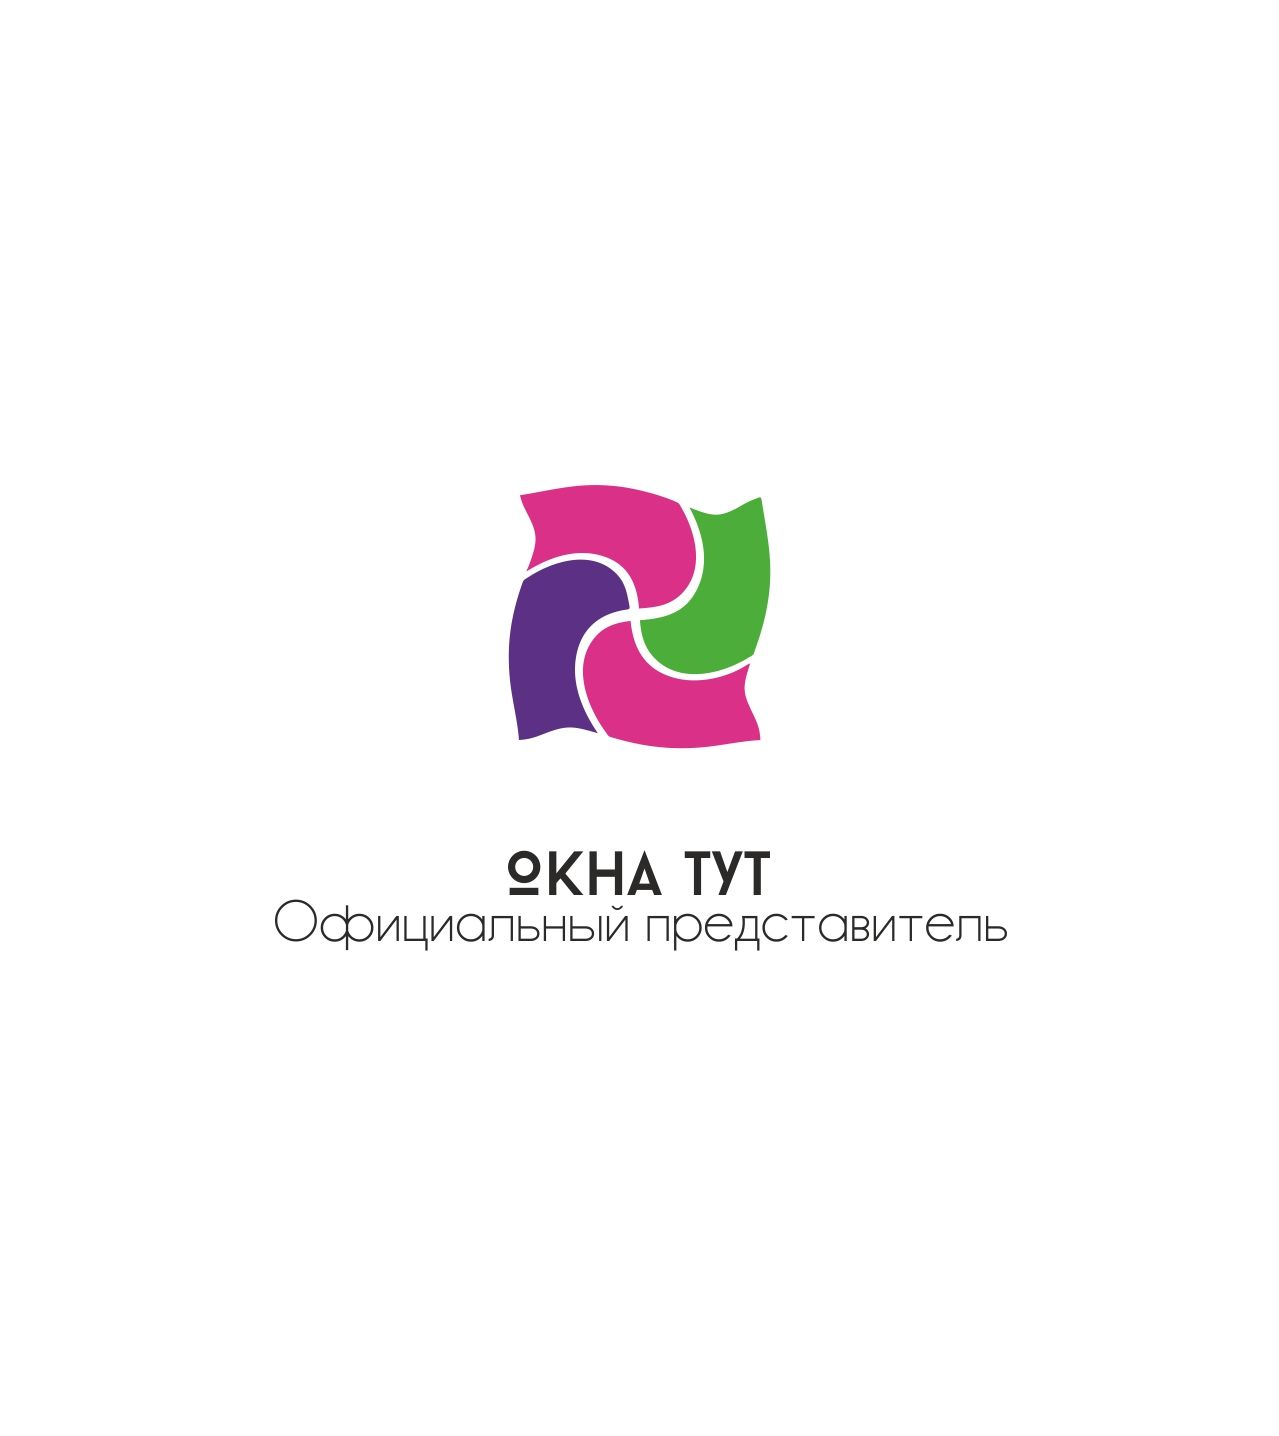 Логотип для сайта Окна тут - дизайнер Cherrytwist